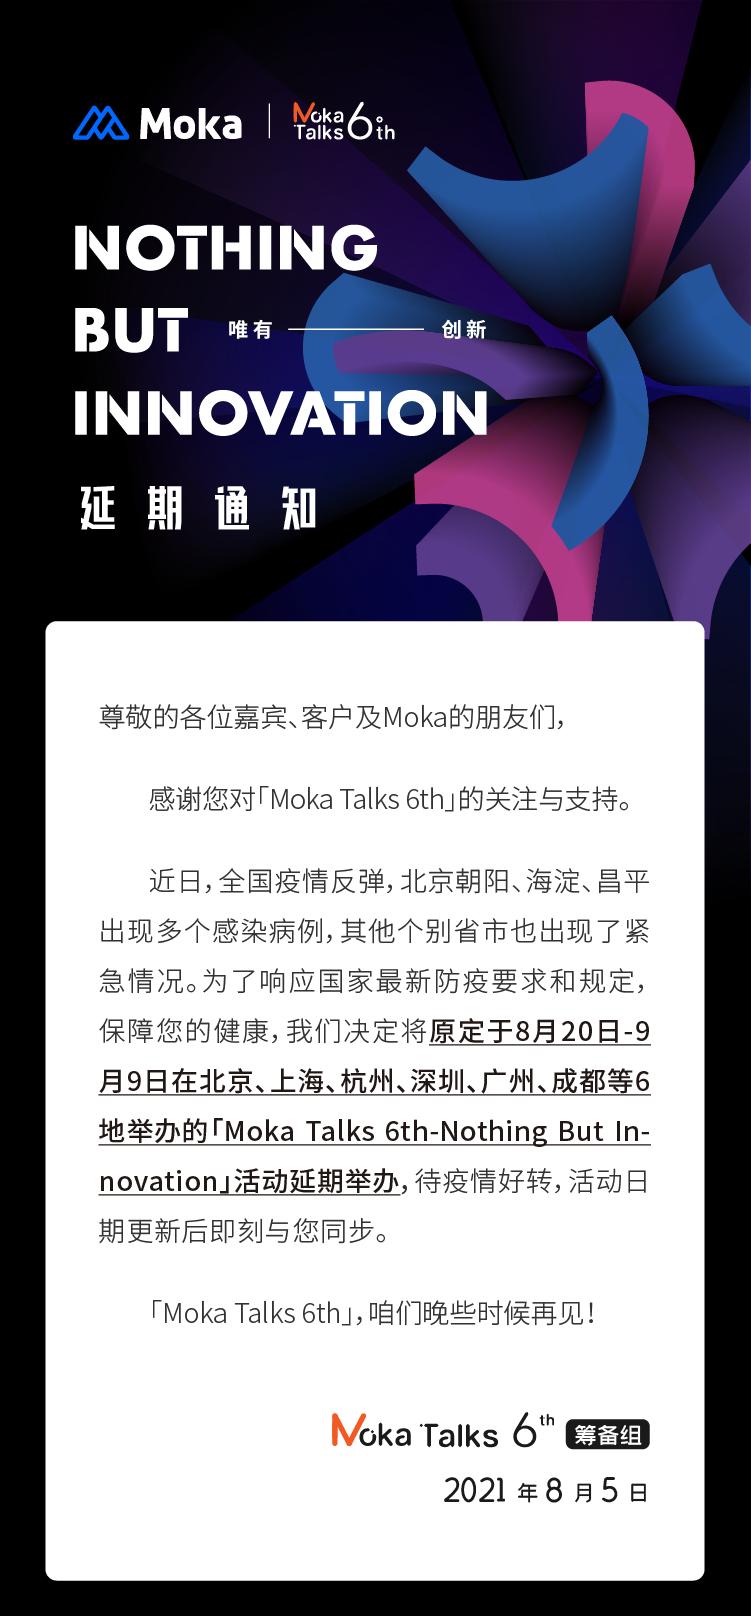 「Moka Talks 6th」延期通知-Moka智能化招聘系统